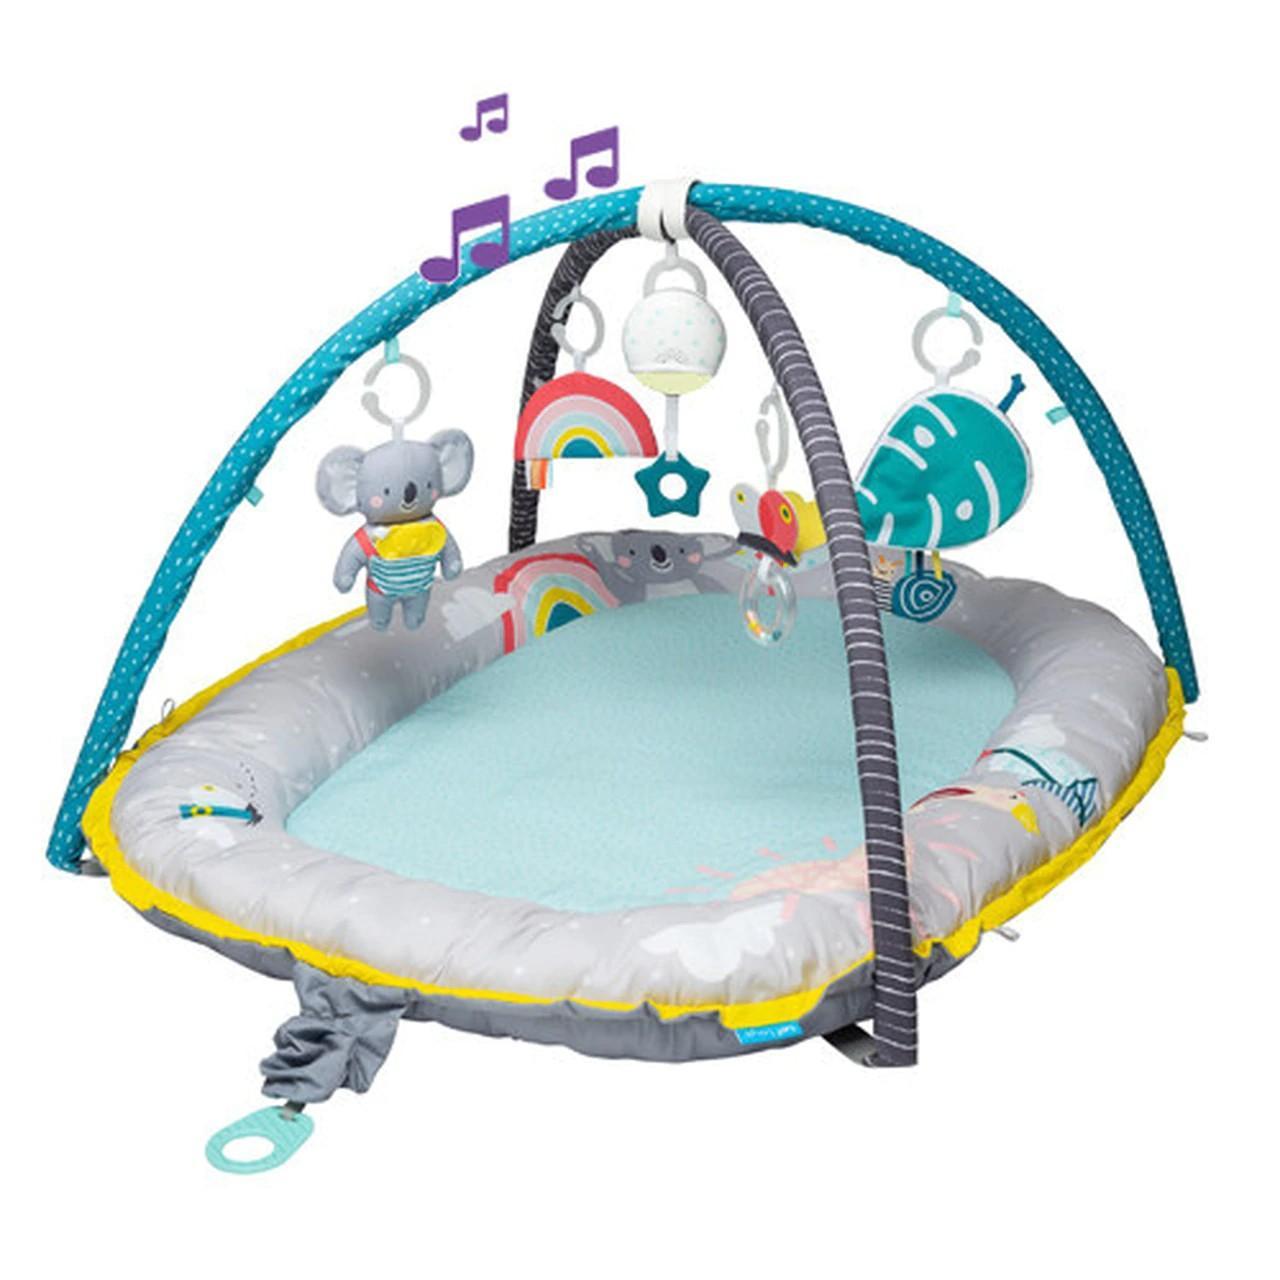 Taf Toys - Koala Musical Newborn Cosy Gym